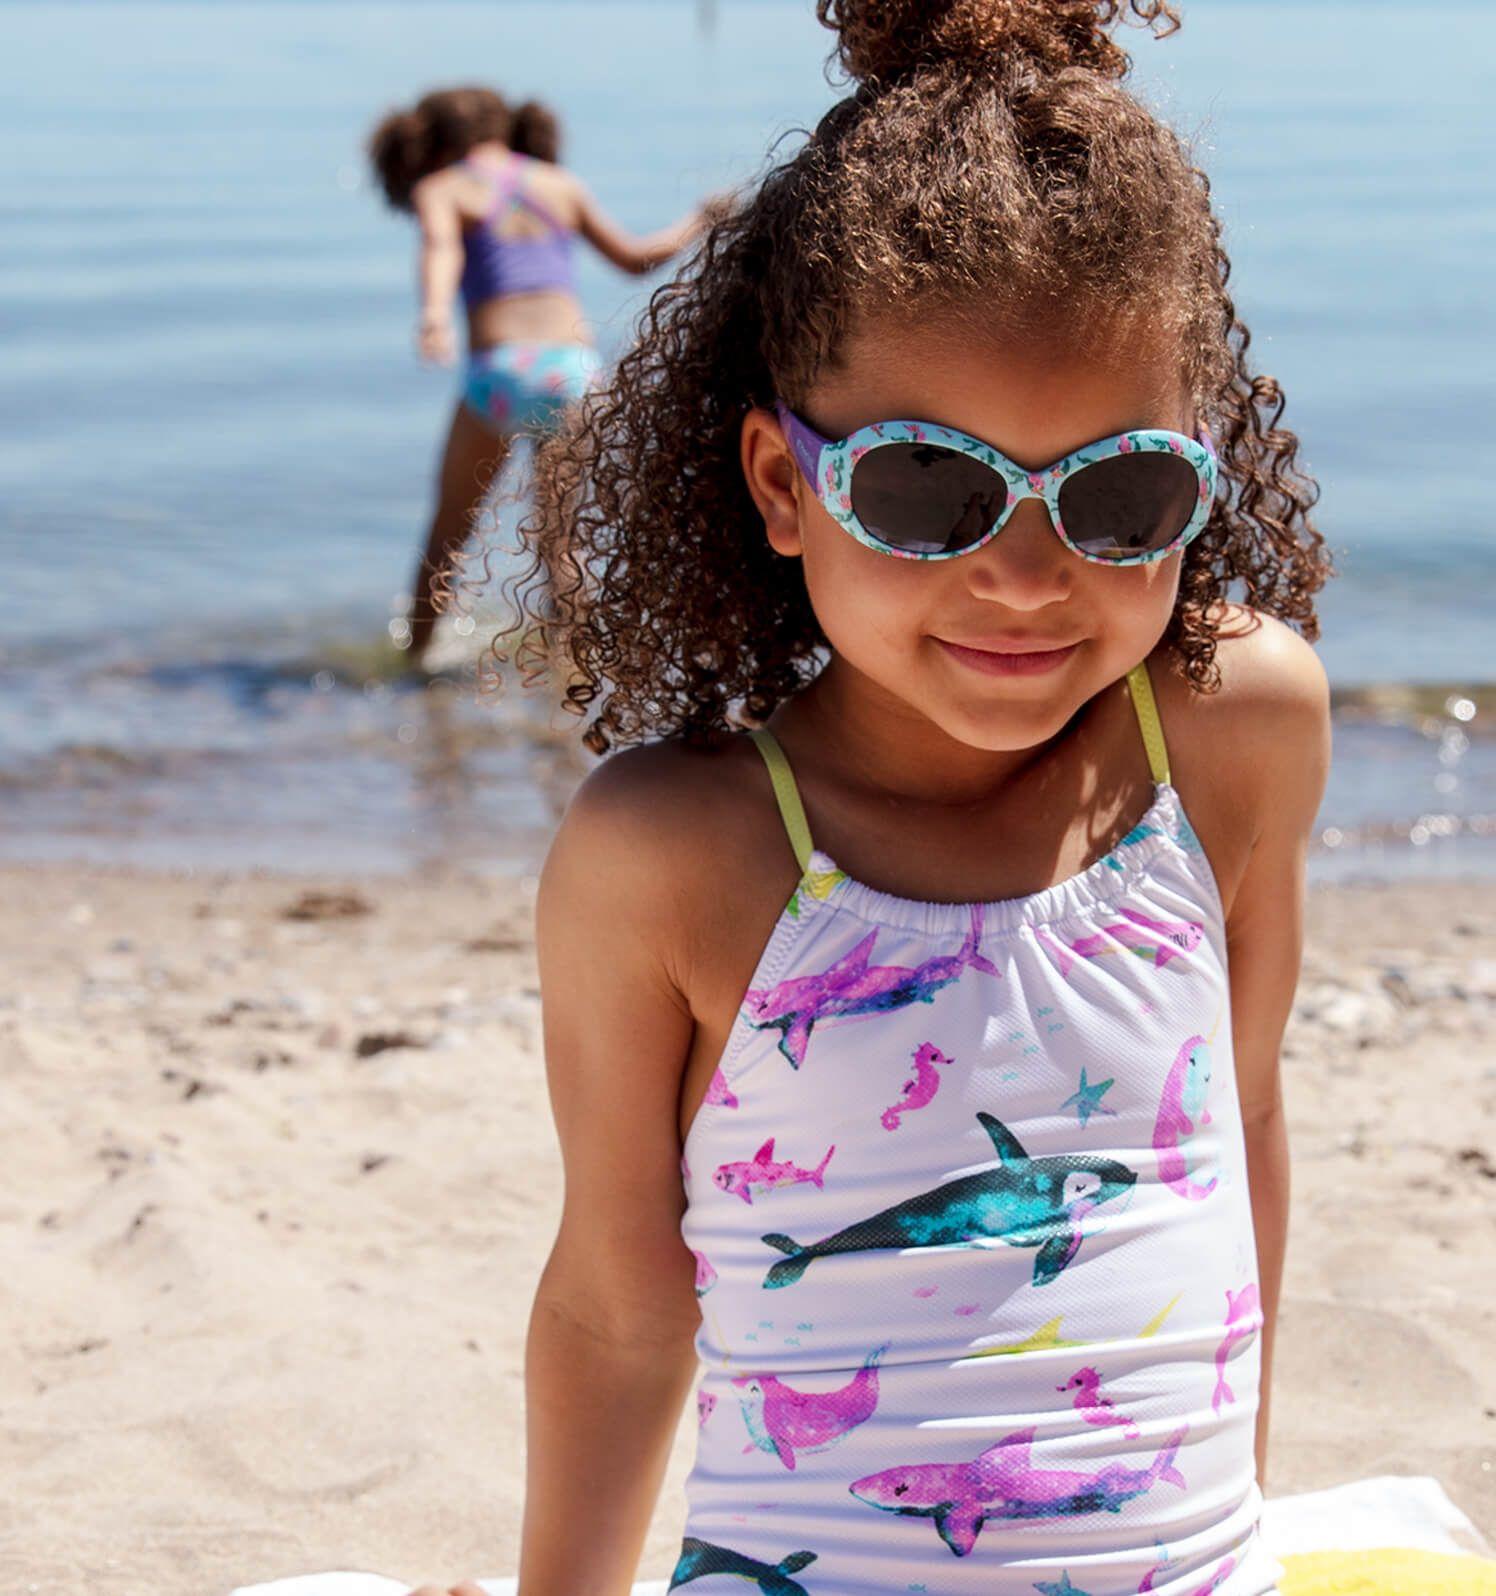 Hatley Girls Sunglasses Swimsuit